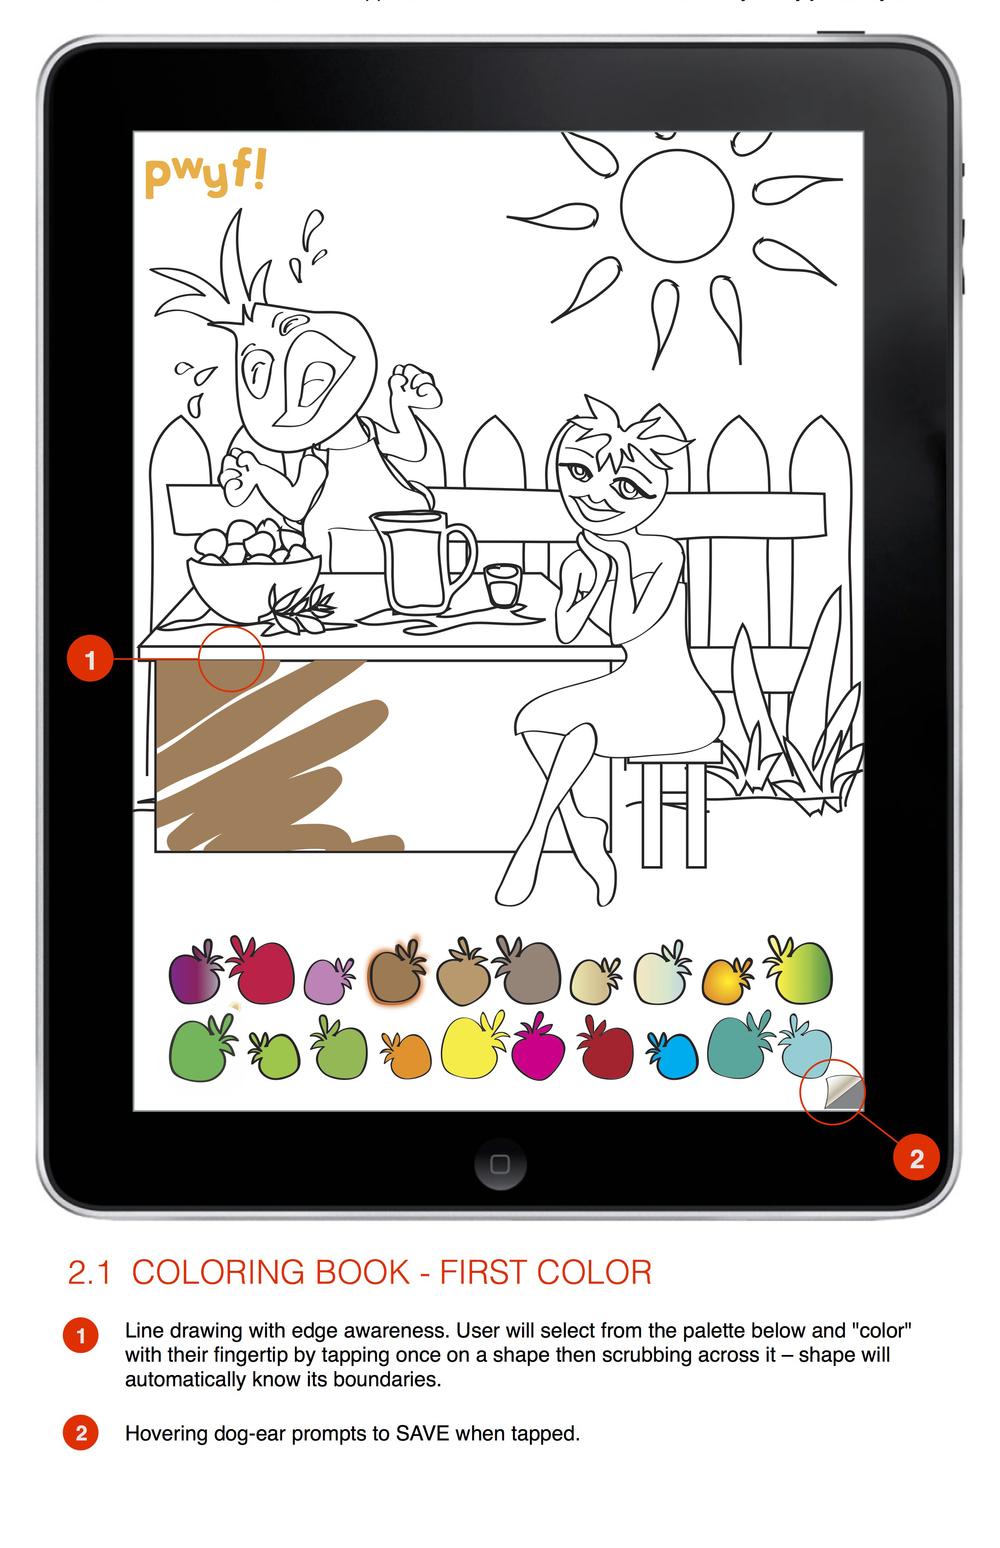 PWYF!_iPadApp_wireframes_large.5.jpg